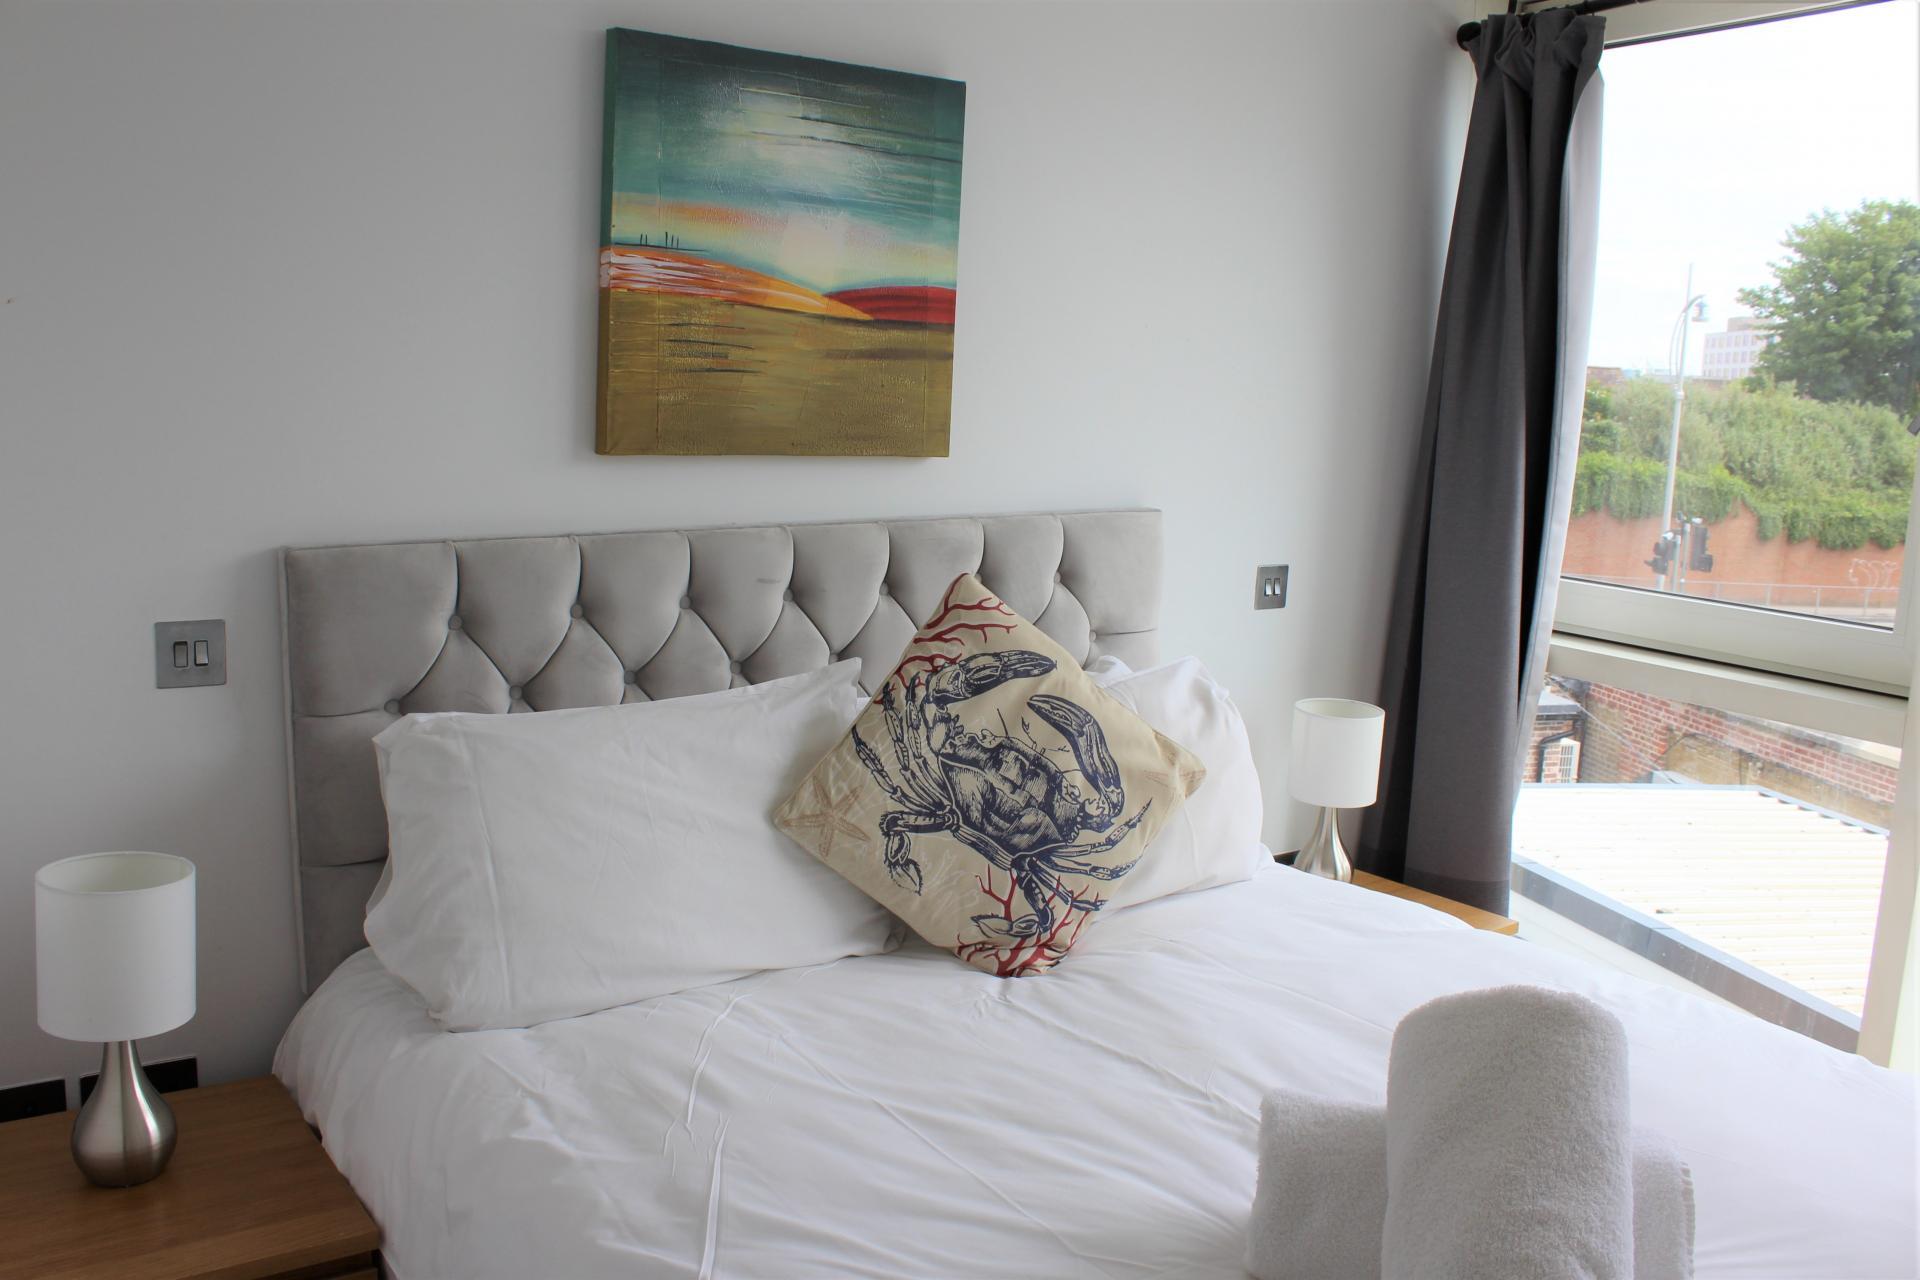 Bedroom at Gunwharf Quays Apartments, Gunwharf Quays, Portsmouth